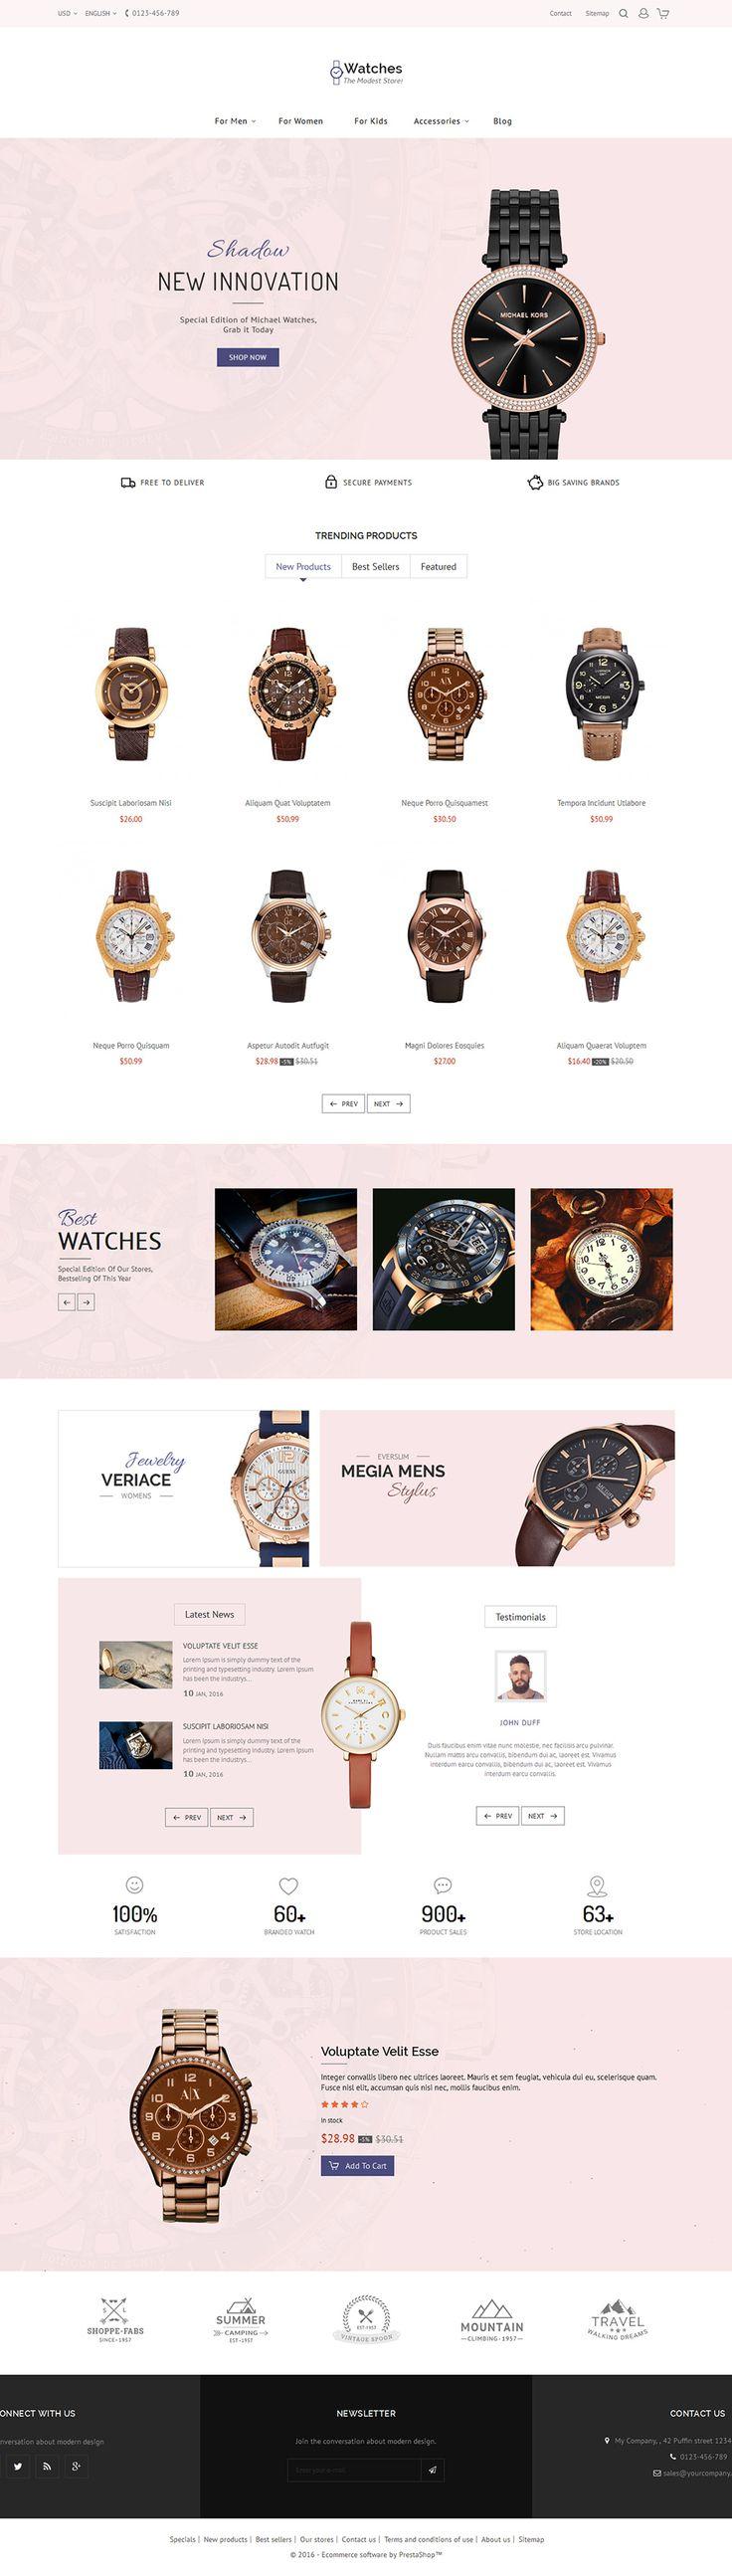 #Watch #Jewelry#Modern - #eCommerce Web Design - #TemplateTrip